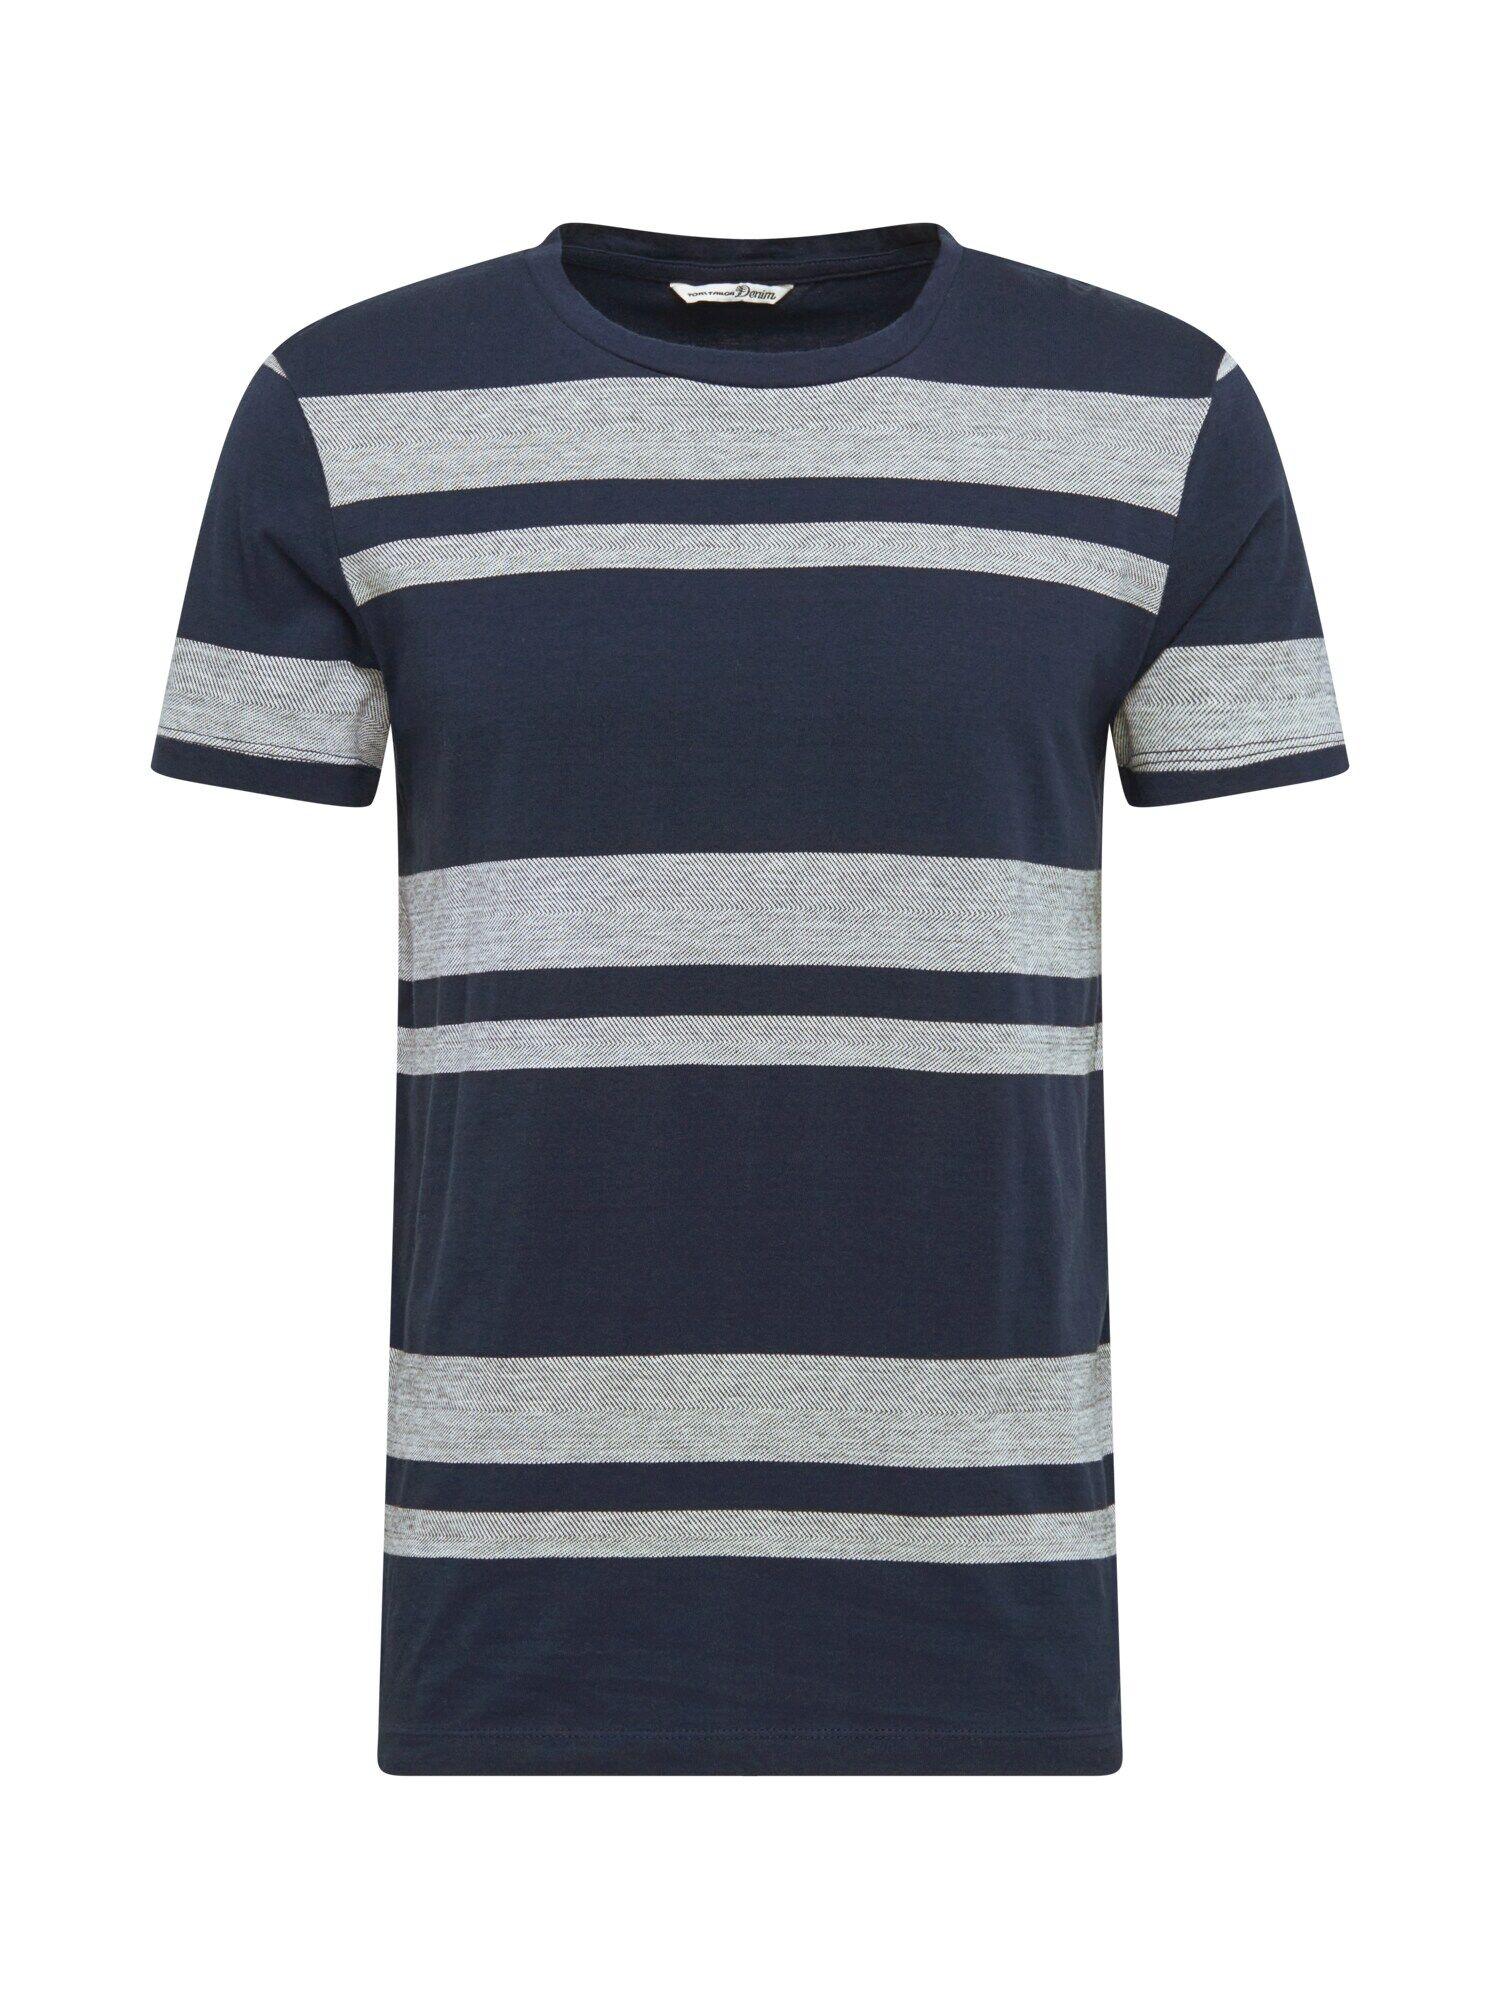 TOM TAILOR DENIM T-Shirt  - Bleu - Taille: XS - male